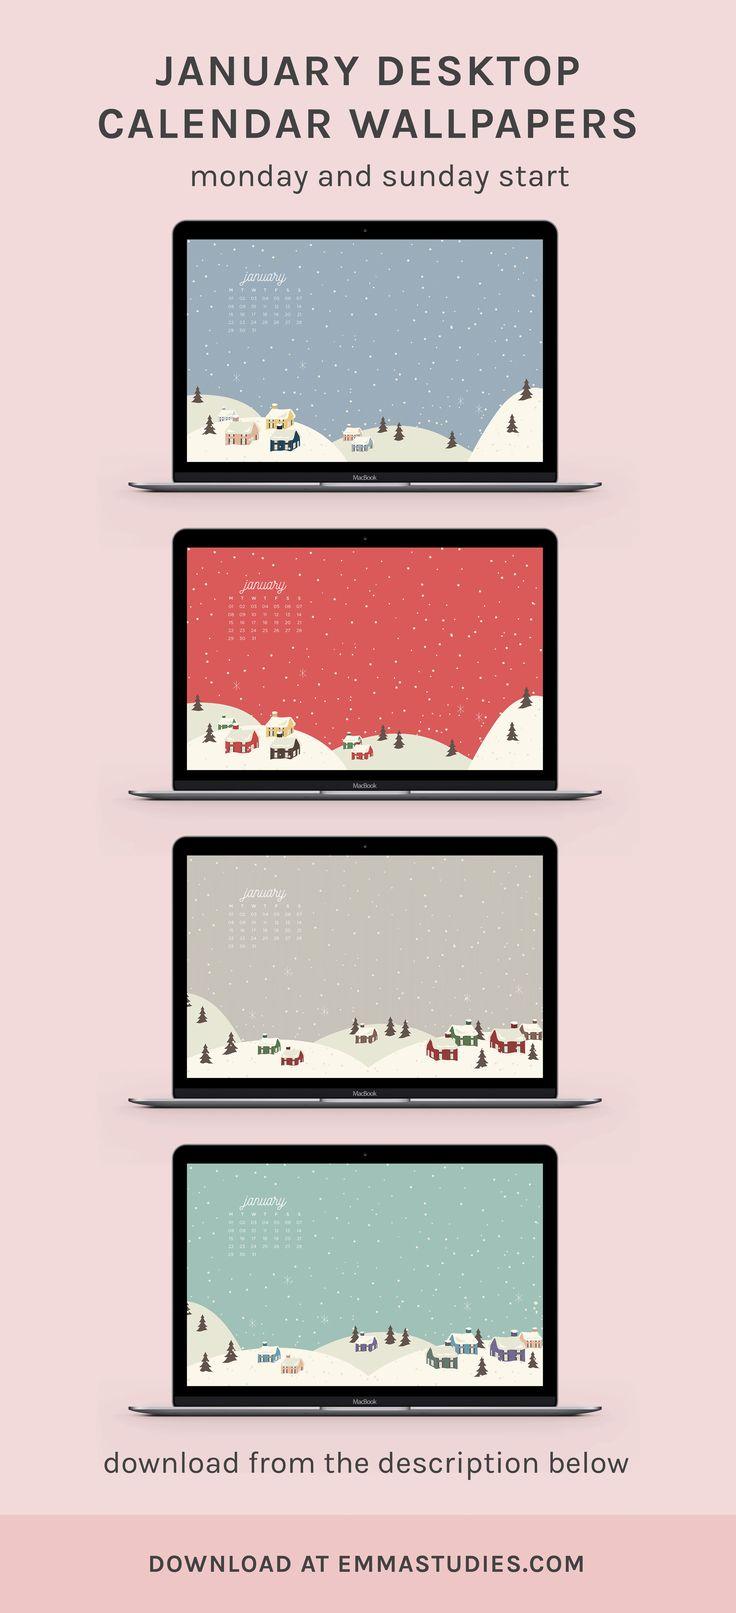 2018 january desktop wallpapers calendars by emmastudies